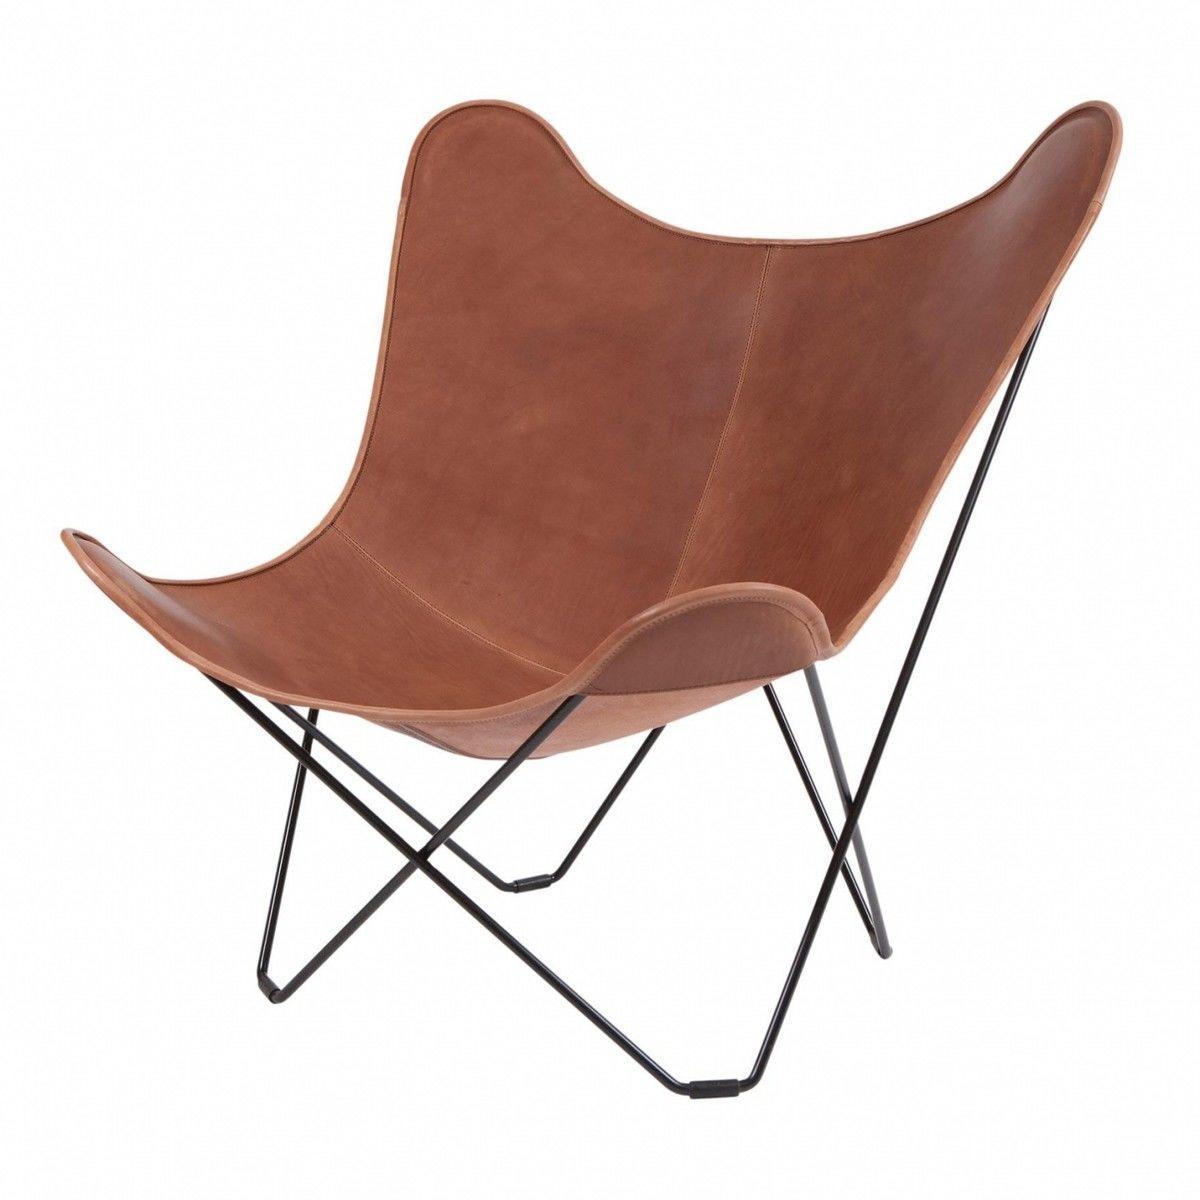 Butterfly chair original - Cuero Pampa Mariposa Butterfly Chair